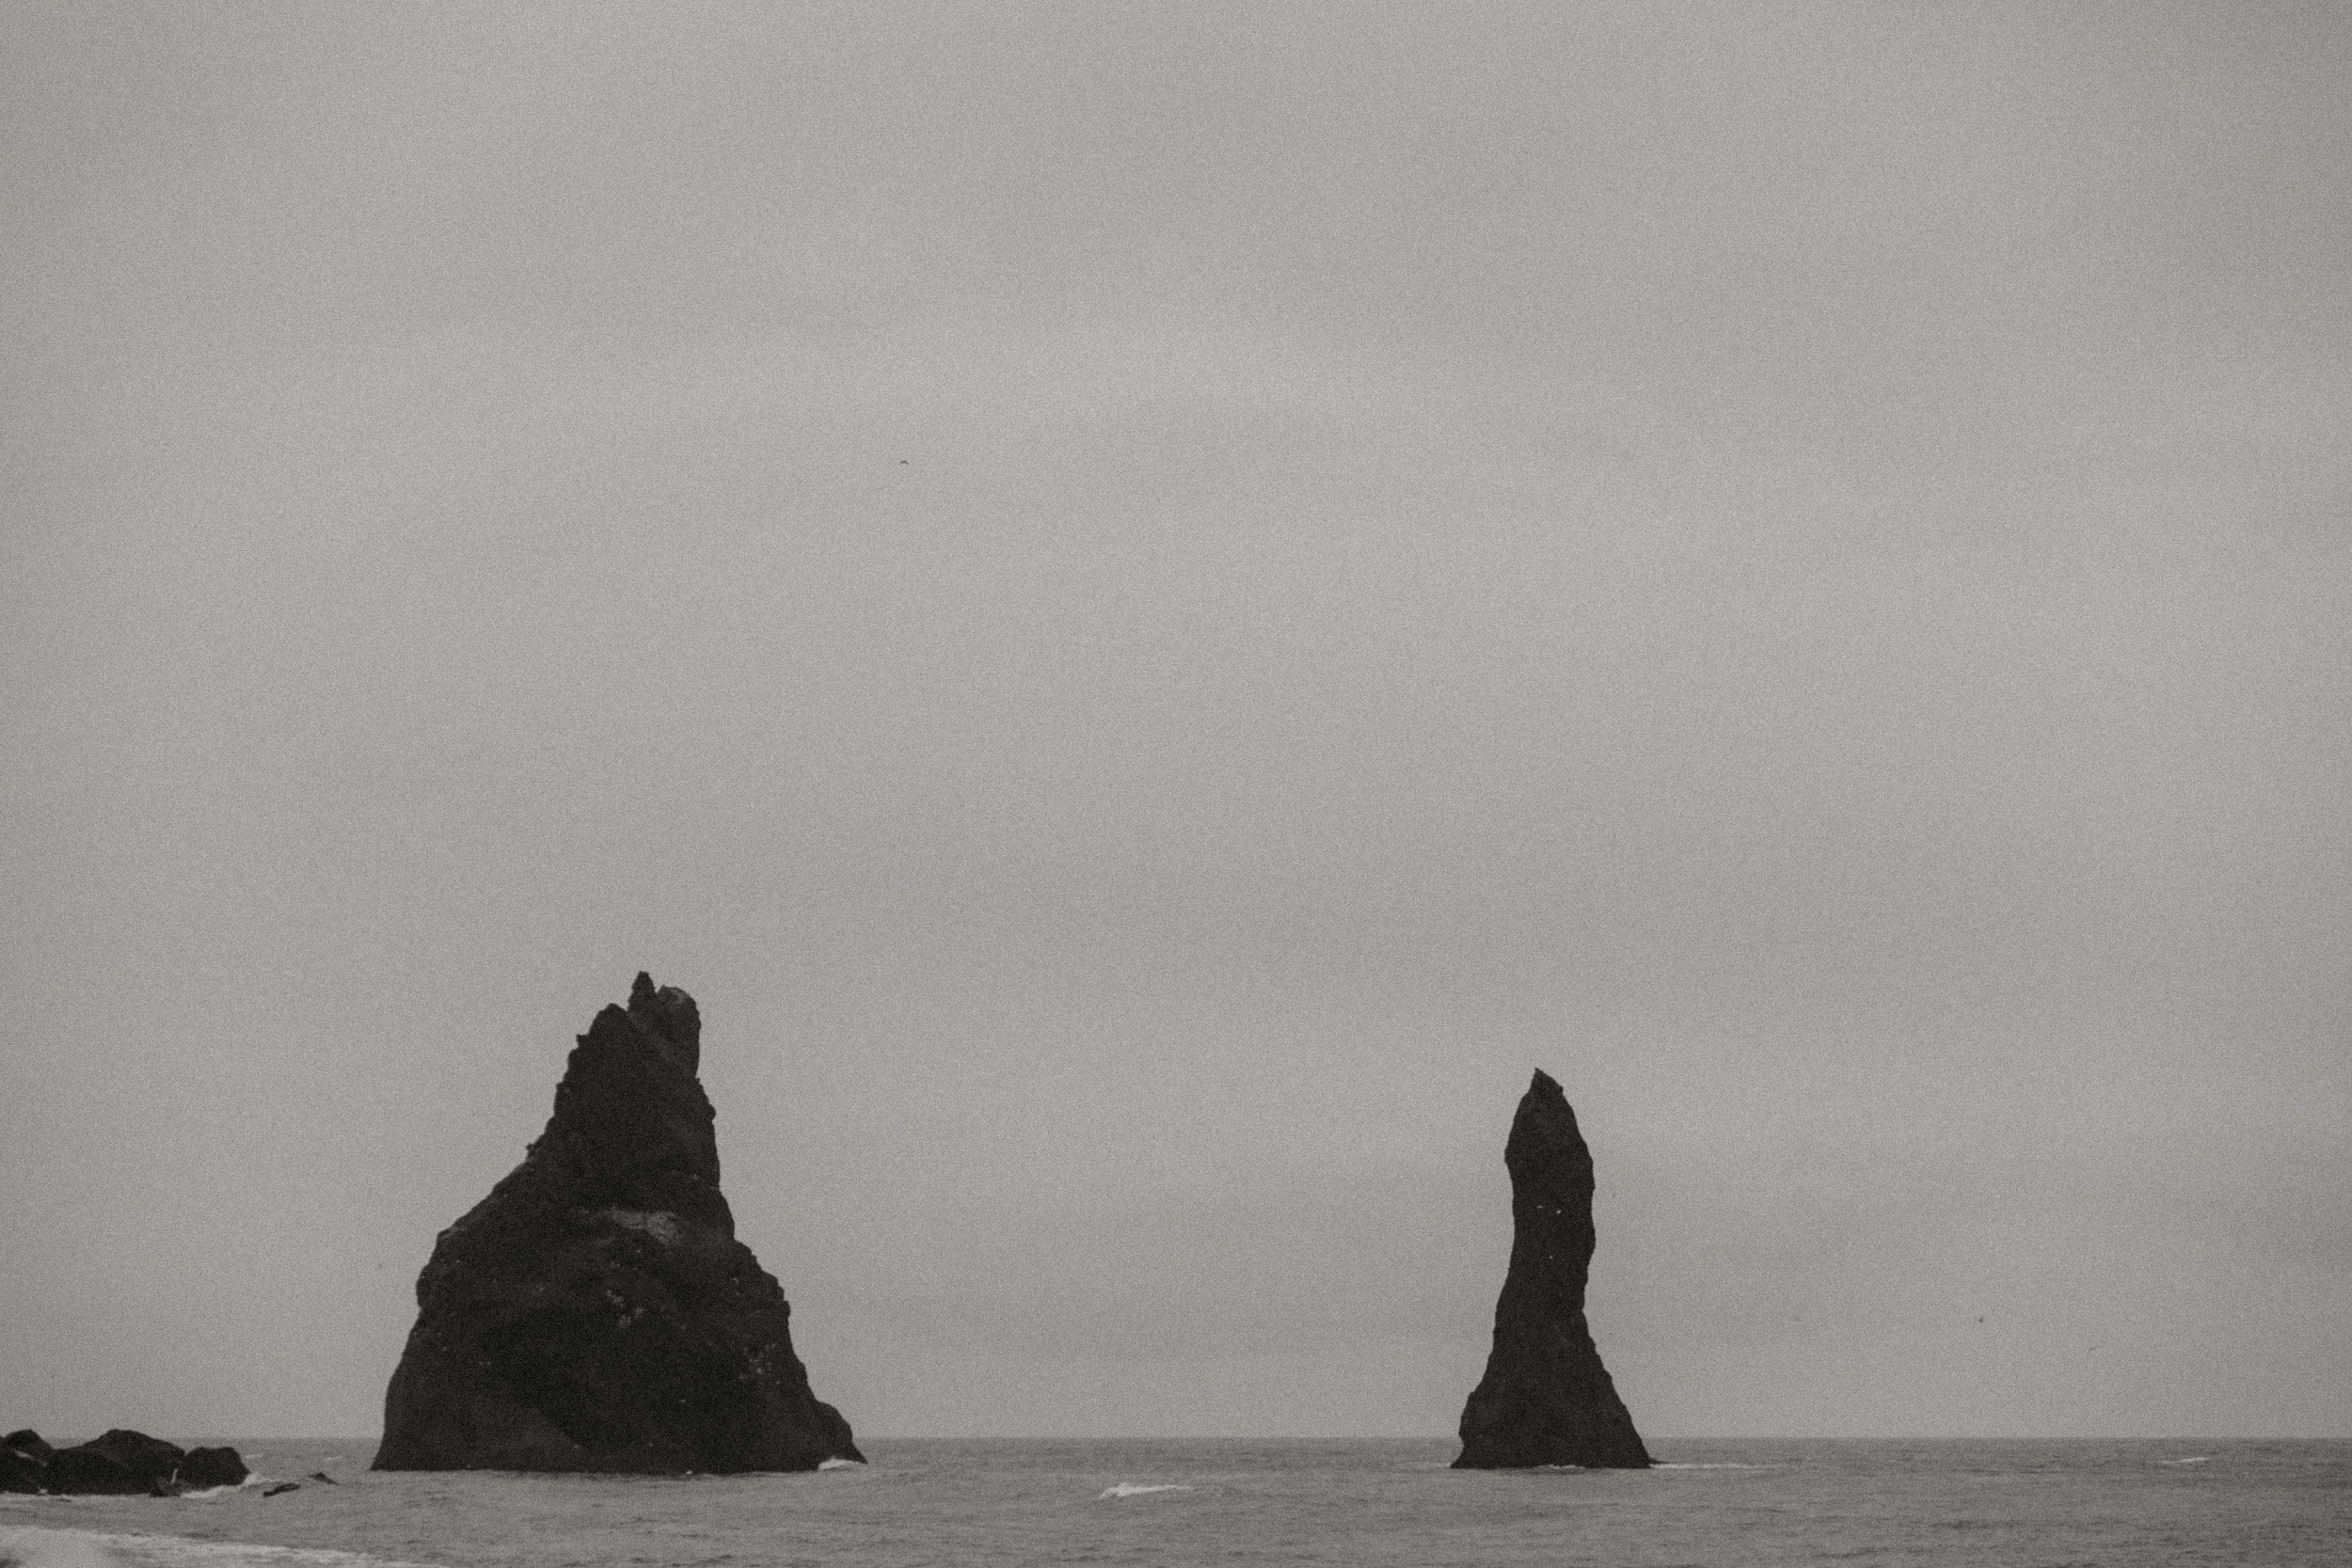 Iceland-honeymoon-4583.jpg